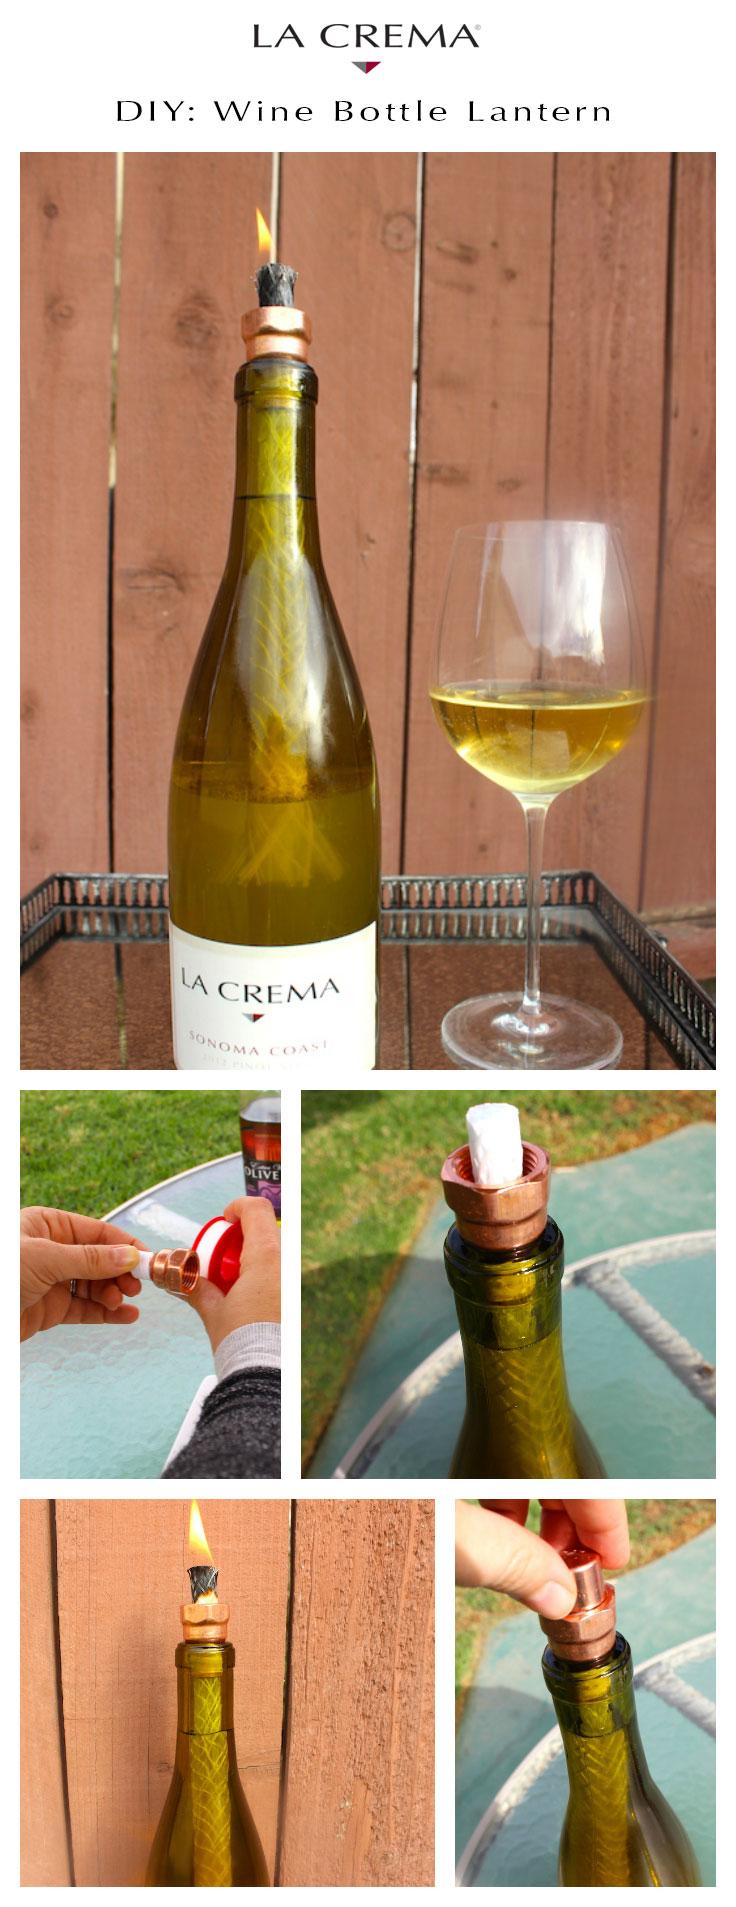 DIY Wine Lantern